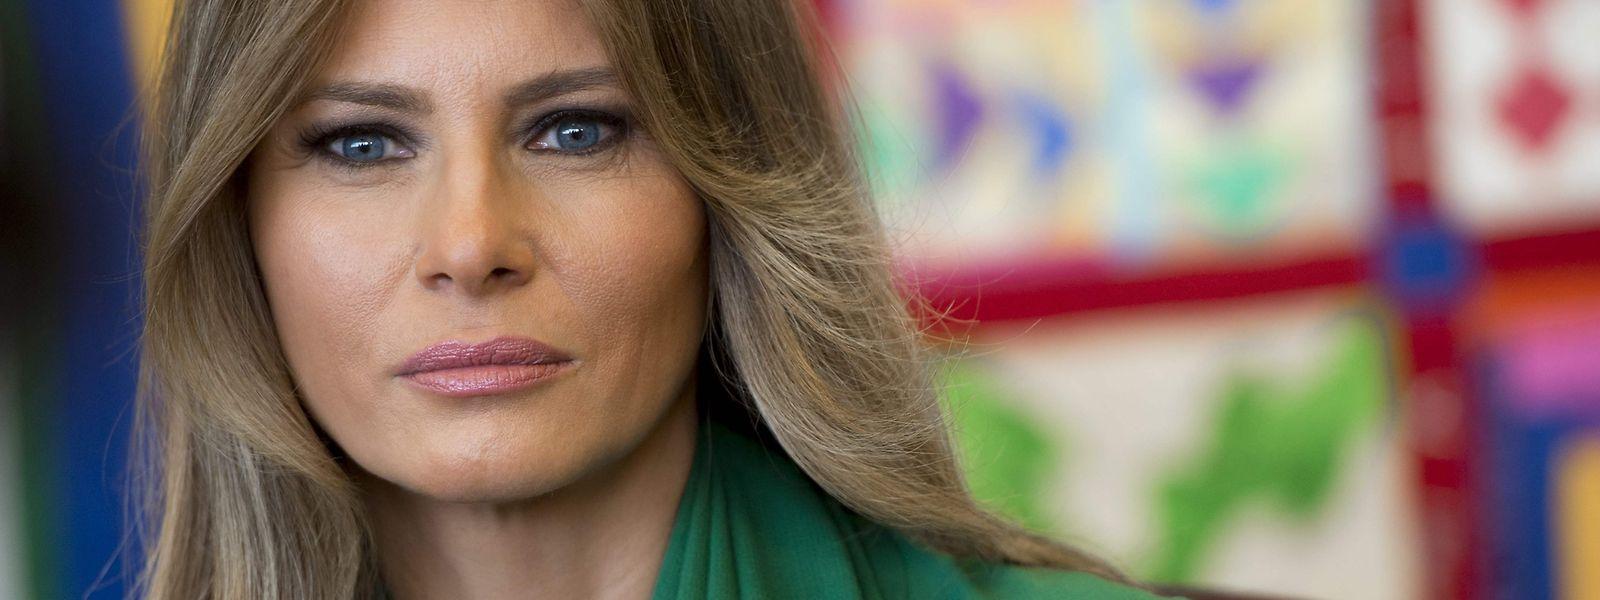 Melania Trump reagierte per Twitter auf die Spekulationen.